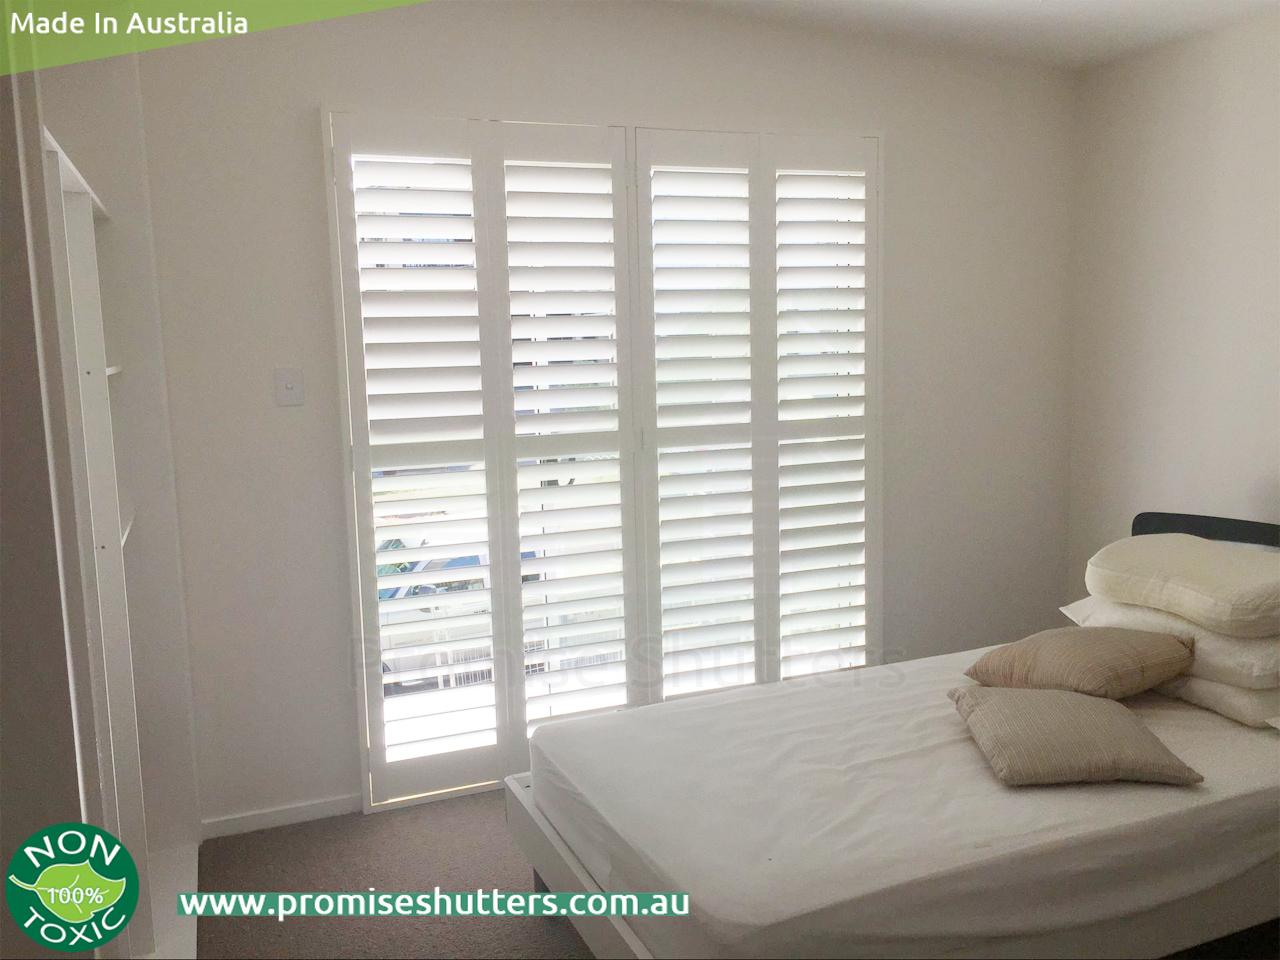 solid Vinyl window shutters installed in 1,2,4 panels, 4 ...